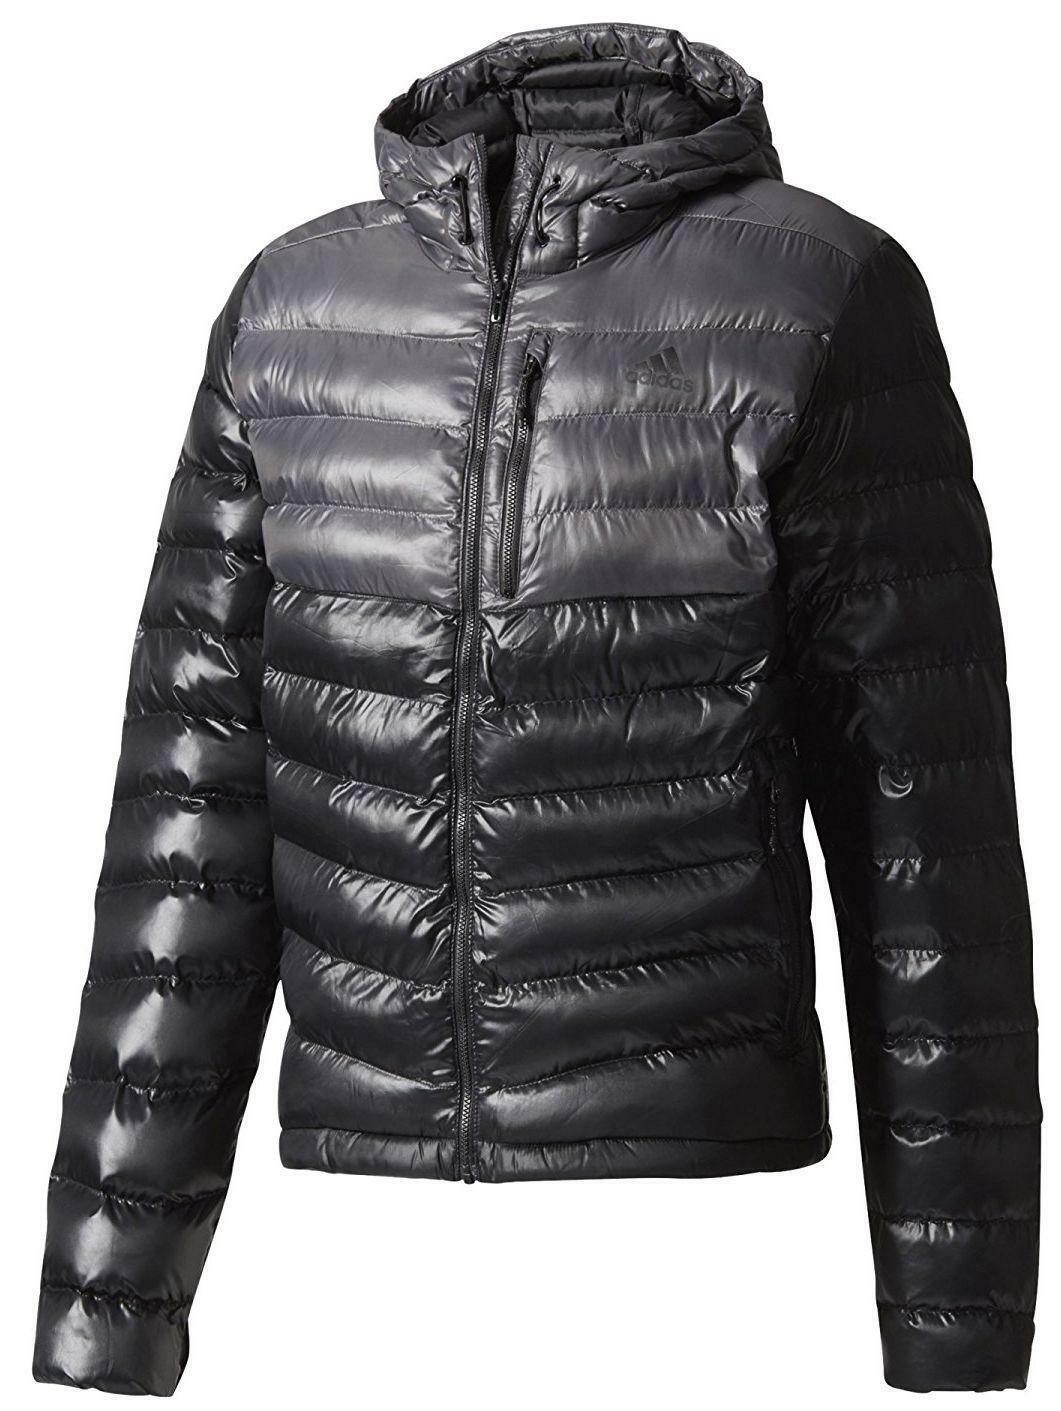 cheap for discount bdd21 d1018 Adidas cytins h giubbotto uomo nero